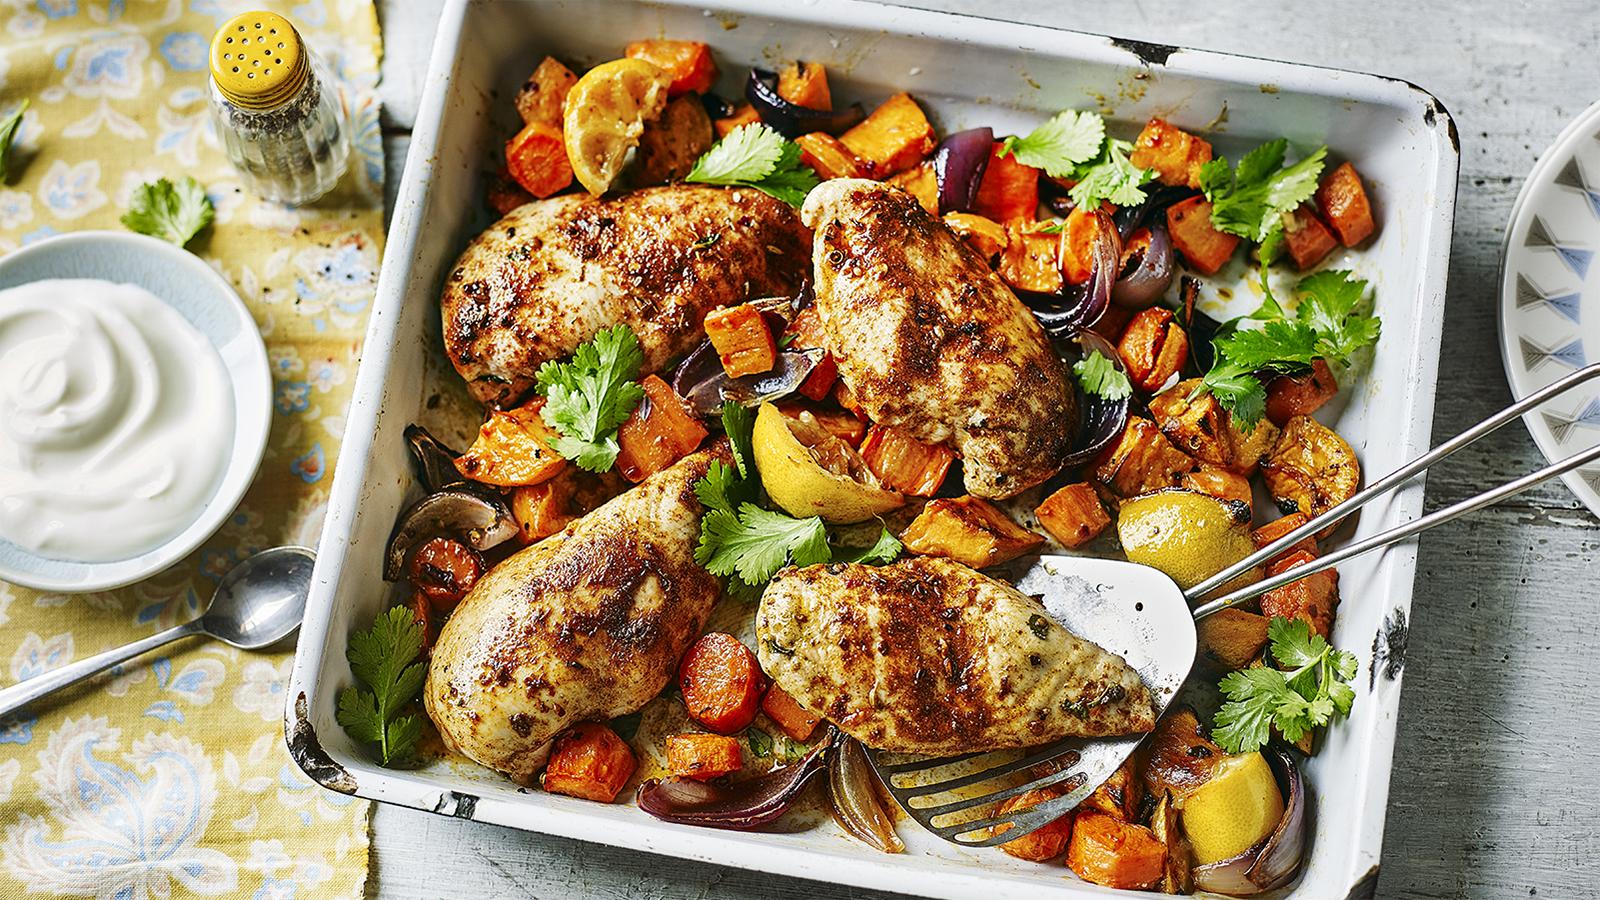 Ras el hanout baked chicken recipe bbc food forumfinder Image collections